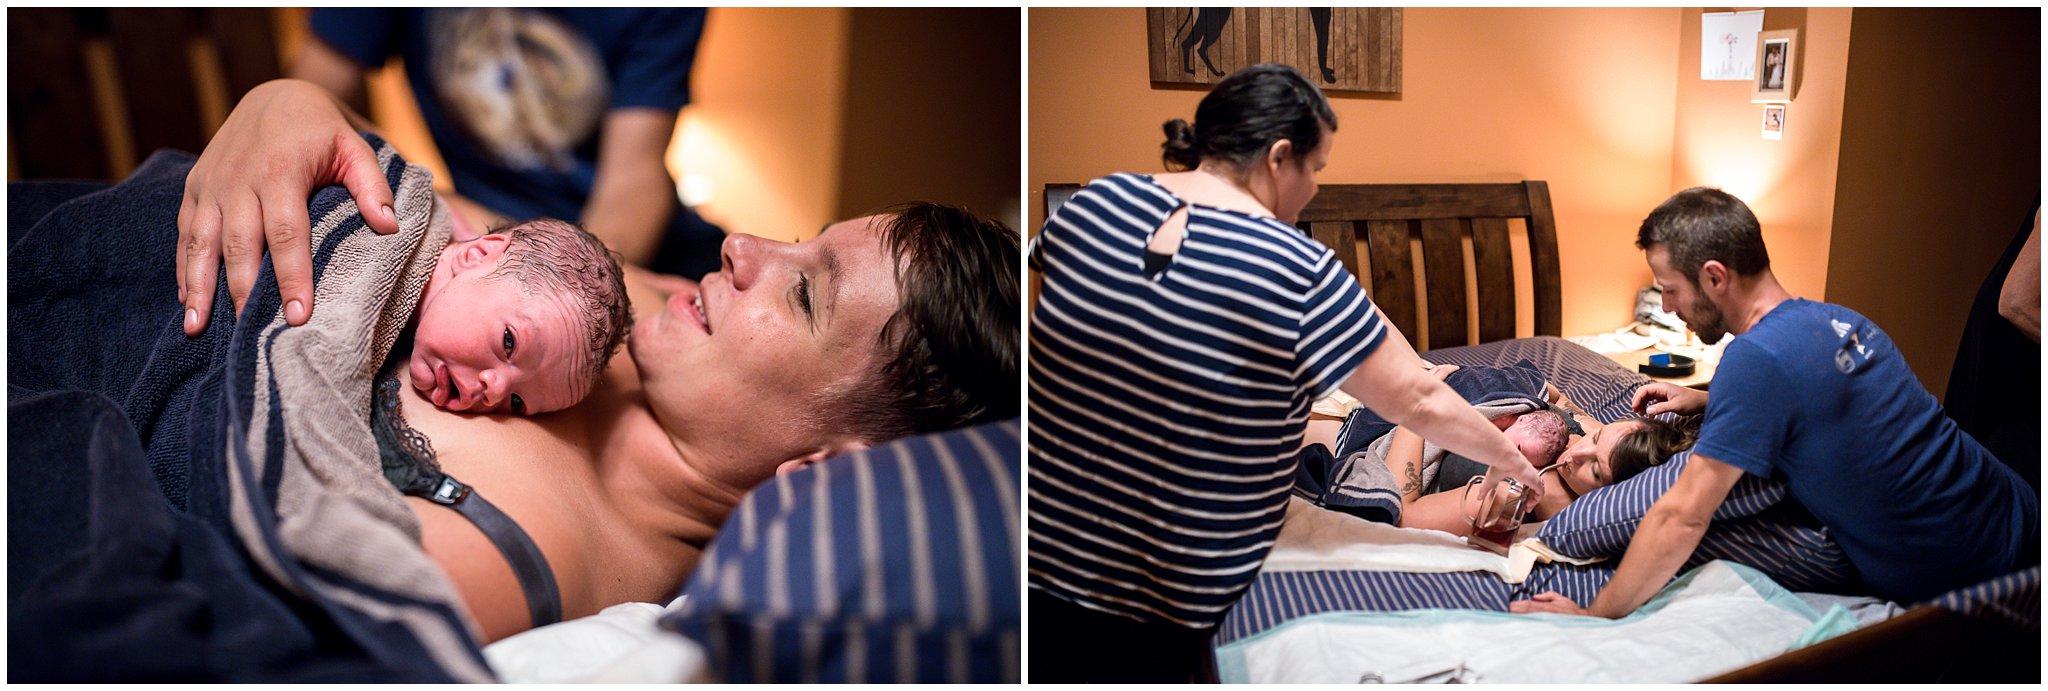 Grand Rapids home birth photographer - Annica Quakenbush - first moments